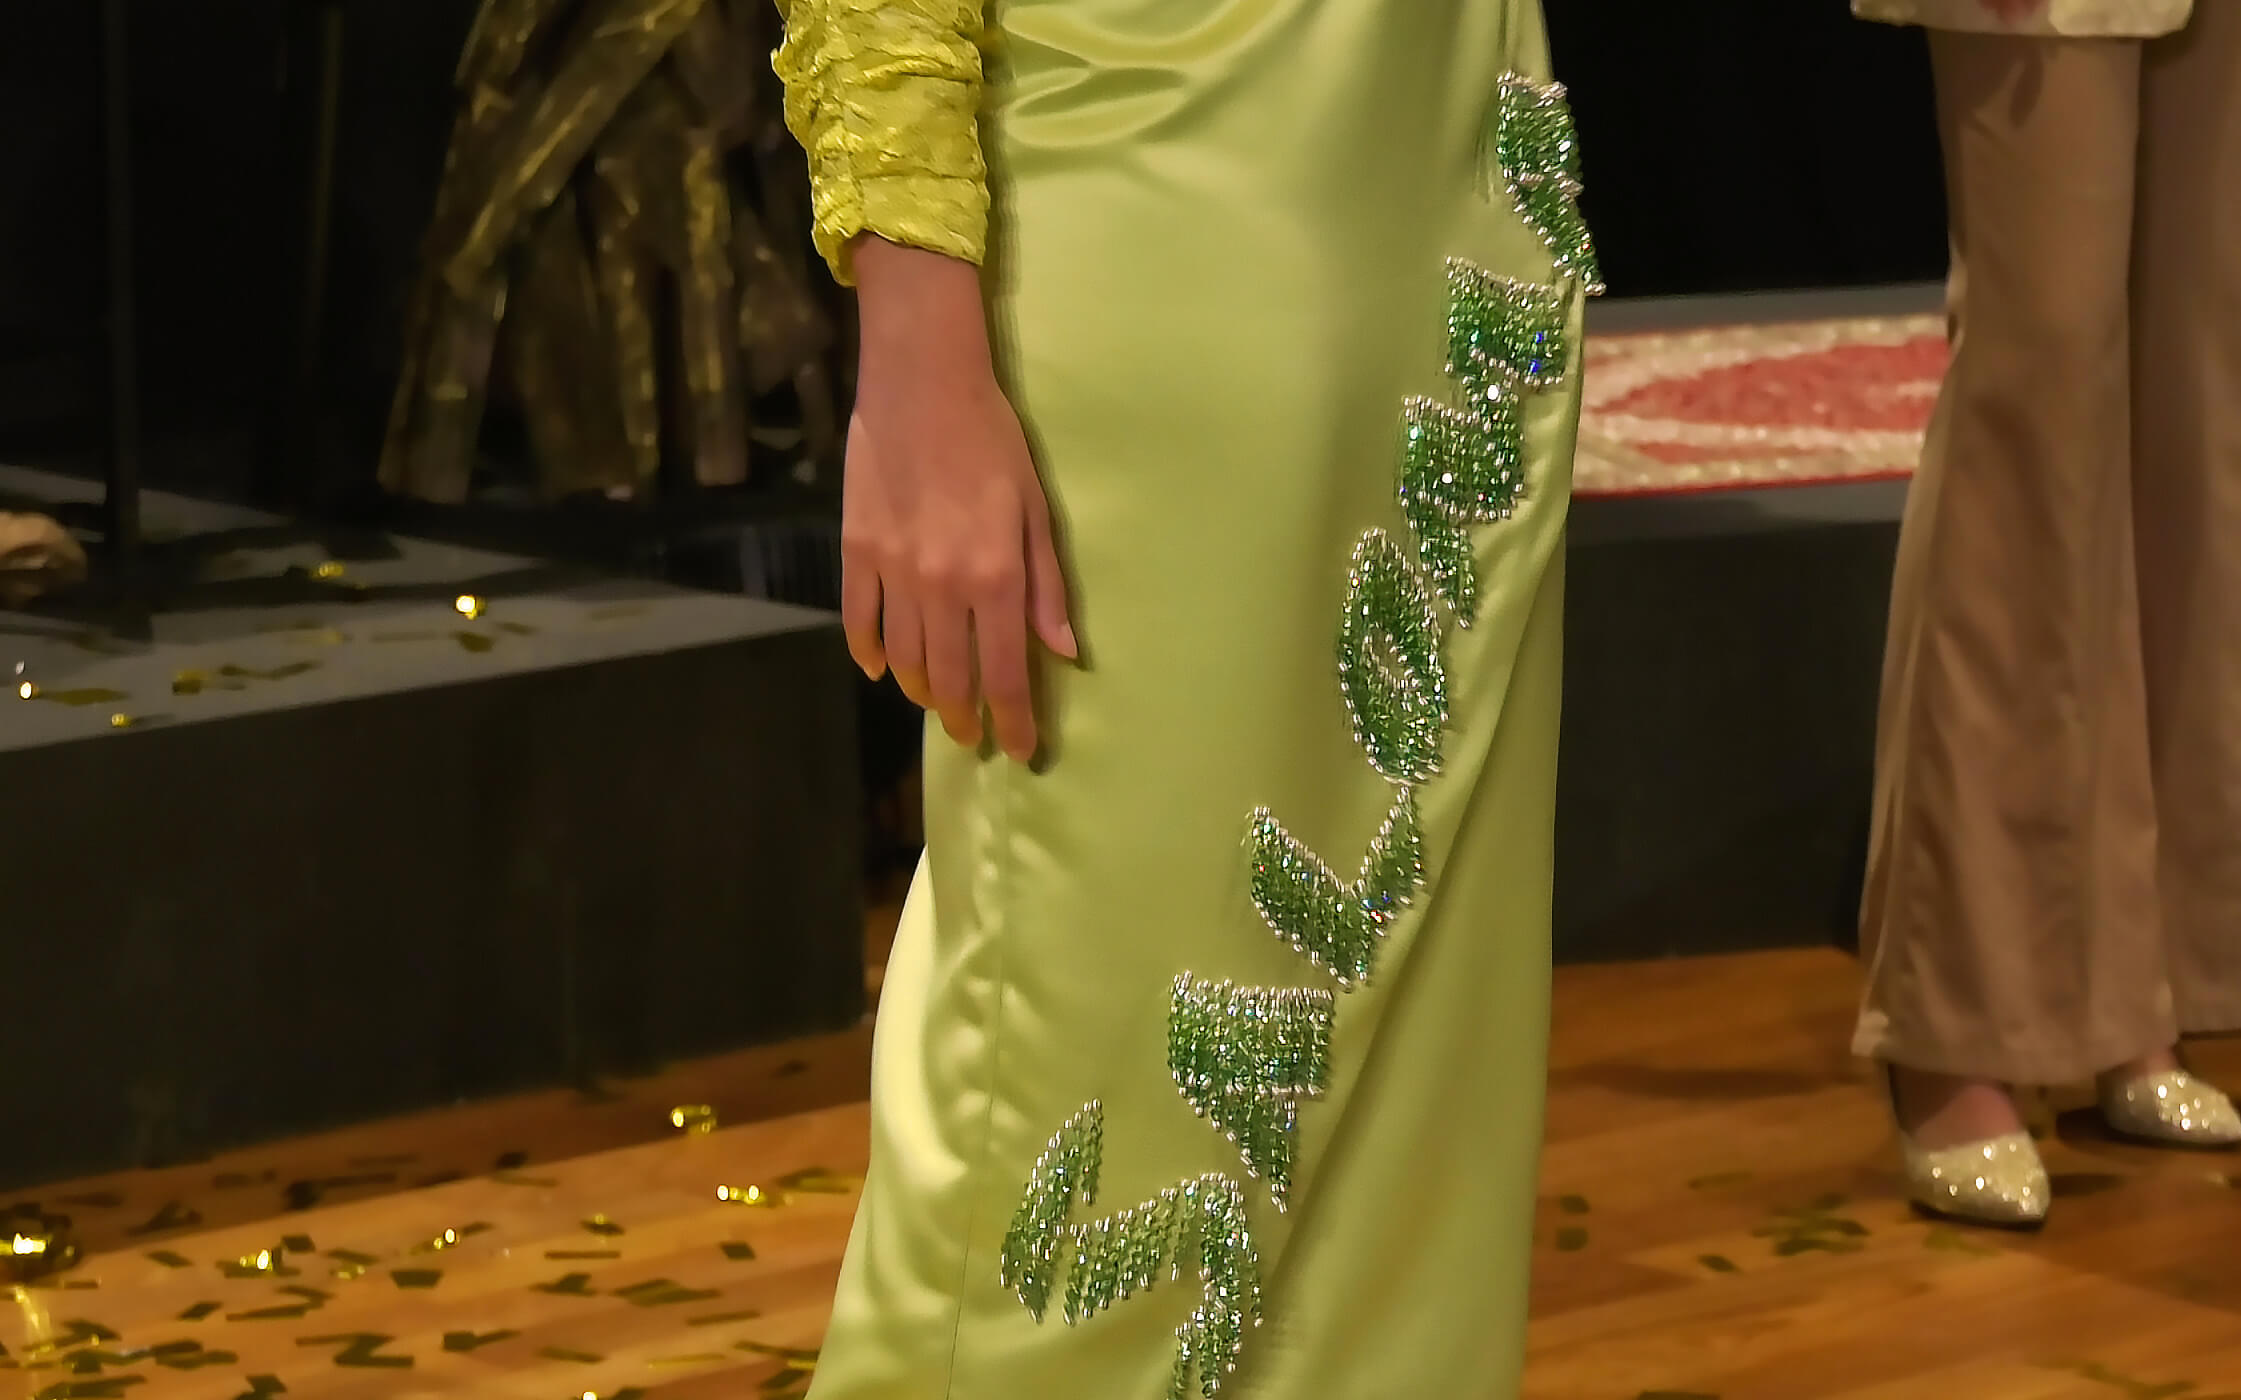 Arab Street URA Raffles Recreating the Textile Culture Collaboration from One Kampung Glam Cahaya Ramadan Live Stream Fashion Show 12